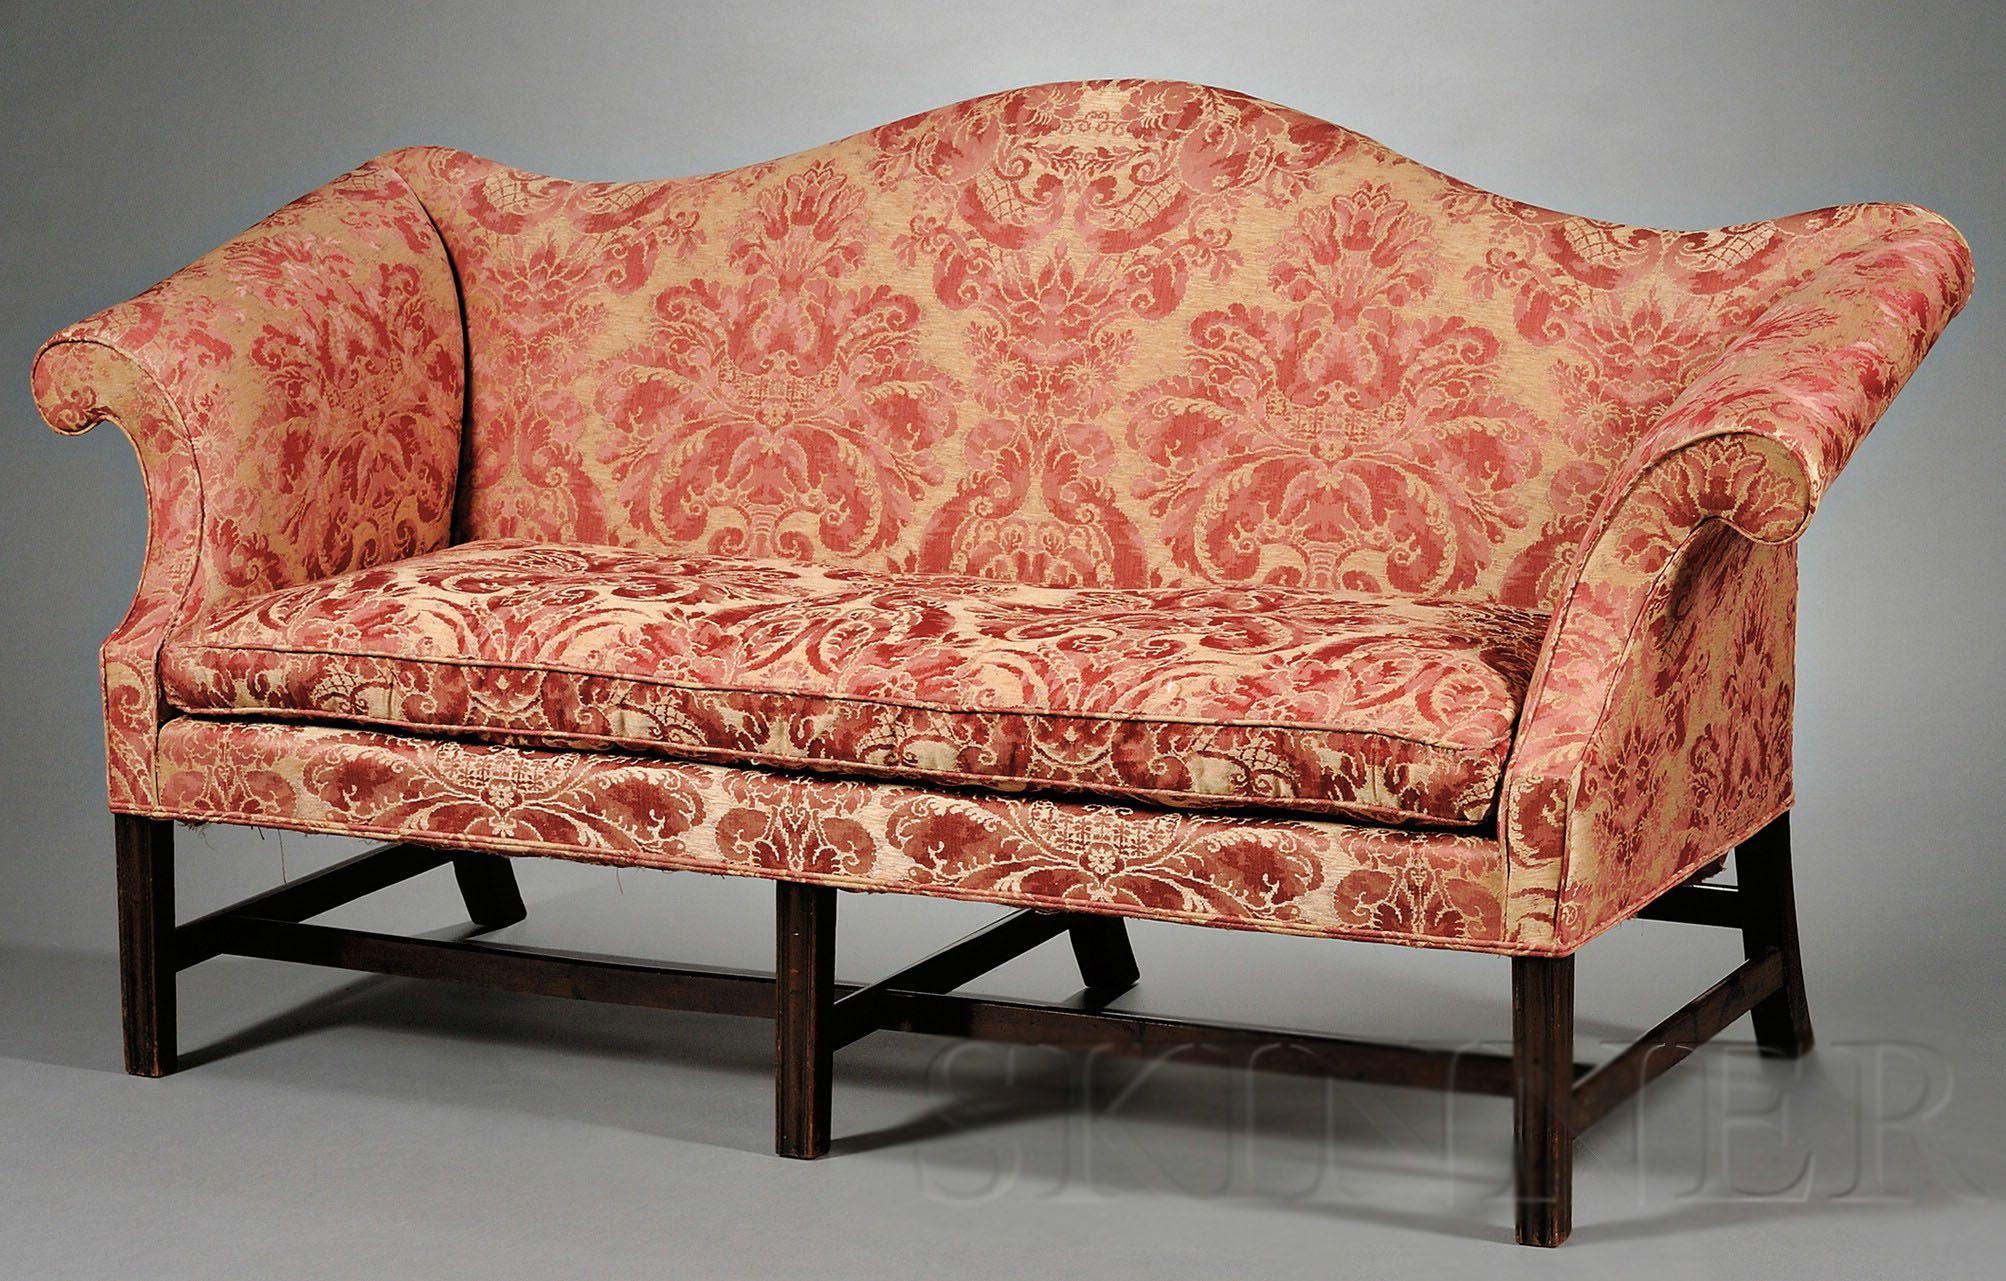 Wondrous Superb Late 18Th Early 19Th C American Carved Mahogany Inzonedesignstudio Interior Chair Design Inzonedesignstudiocom